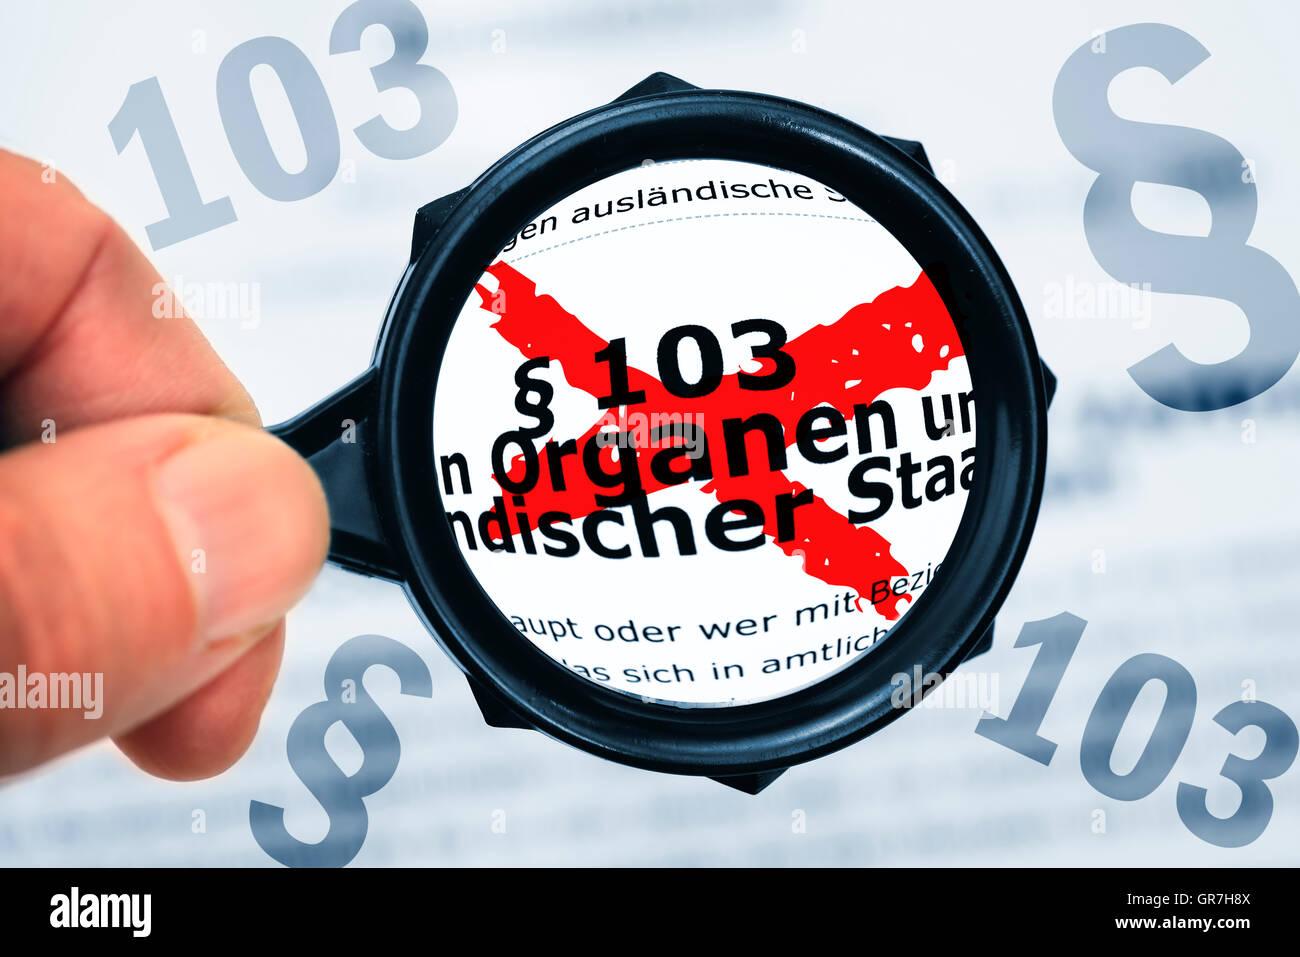 Public German Penal Law, Article 103 - Stock Image